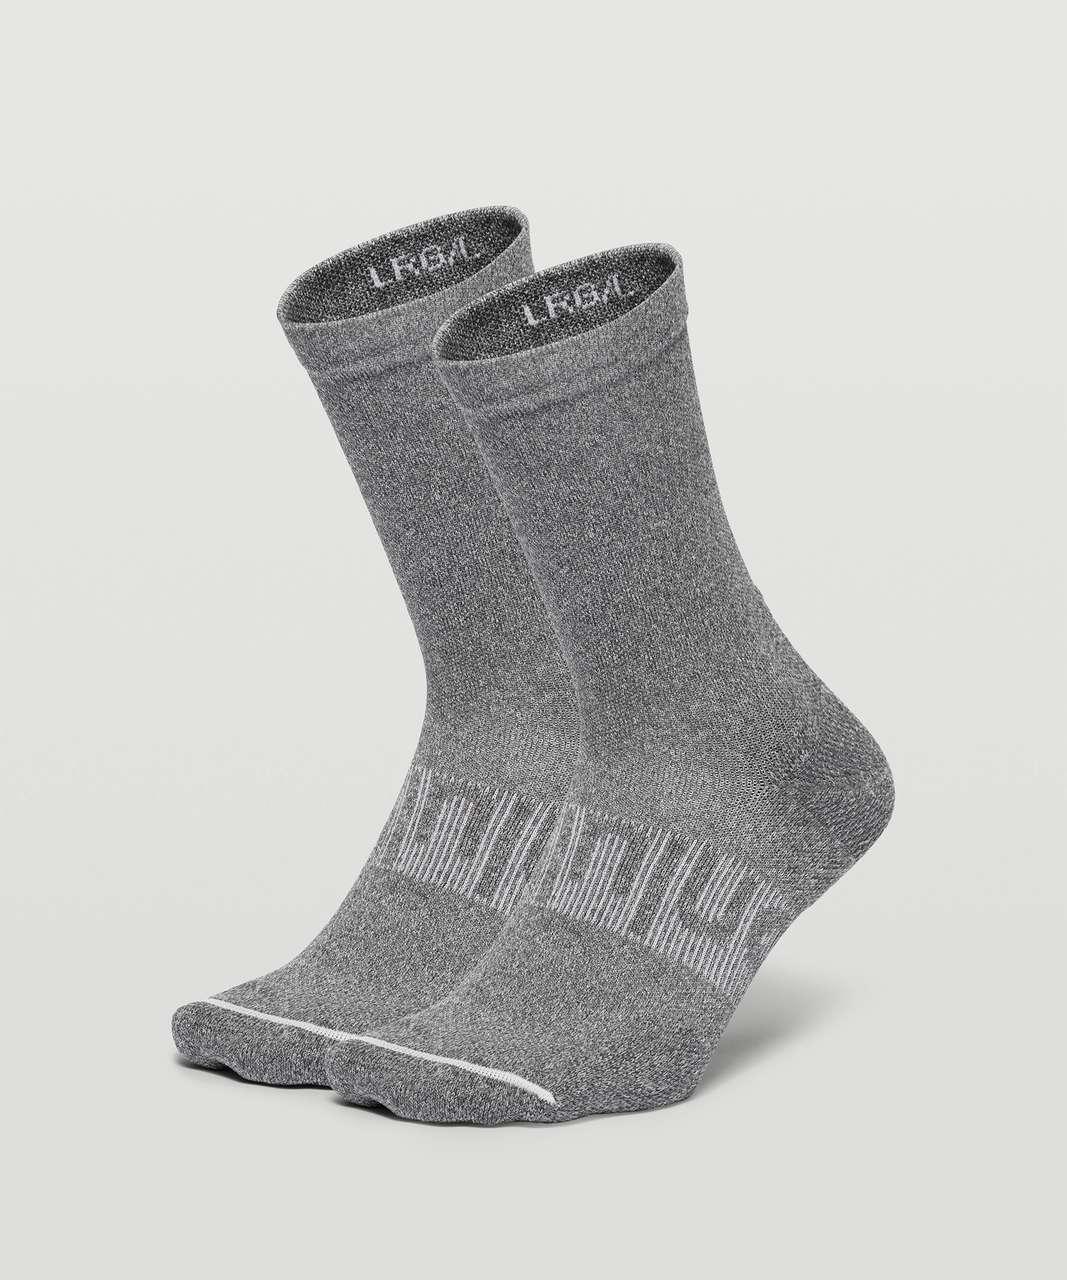 Lululemon Power Stride Crew Sock *2 Pack - Heathered Graphite Grey